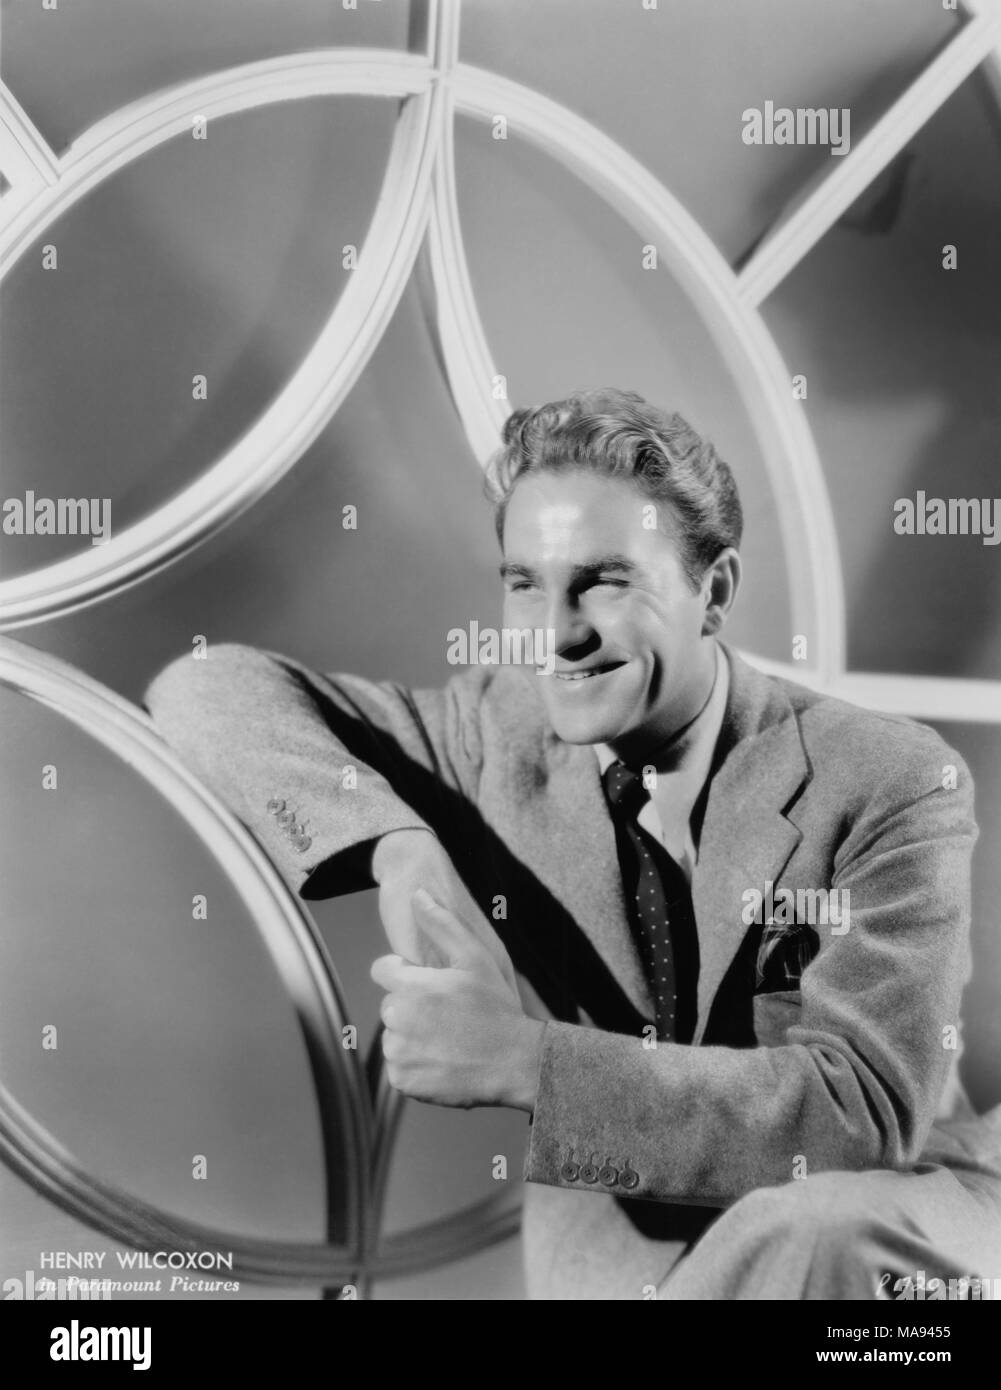 Actor Henry Wilcoxon, Publicity Portrait, Paramount Pictures, 1930's - Stock Image